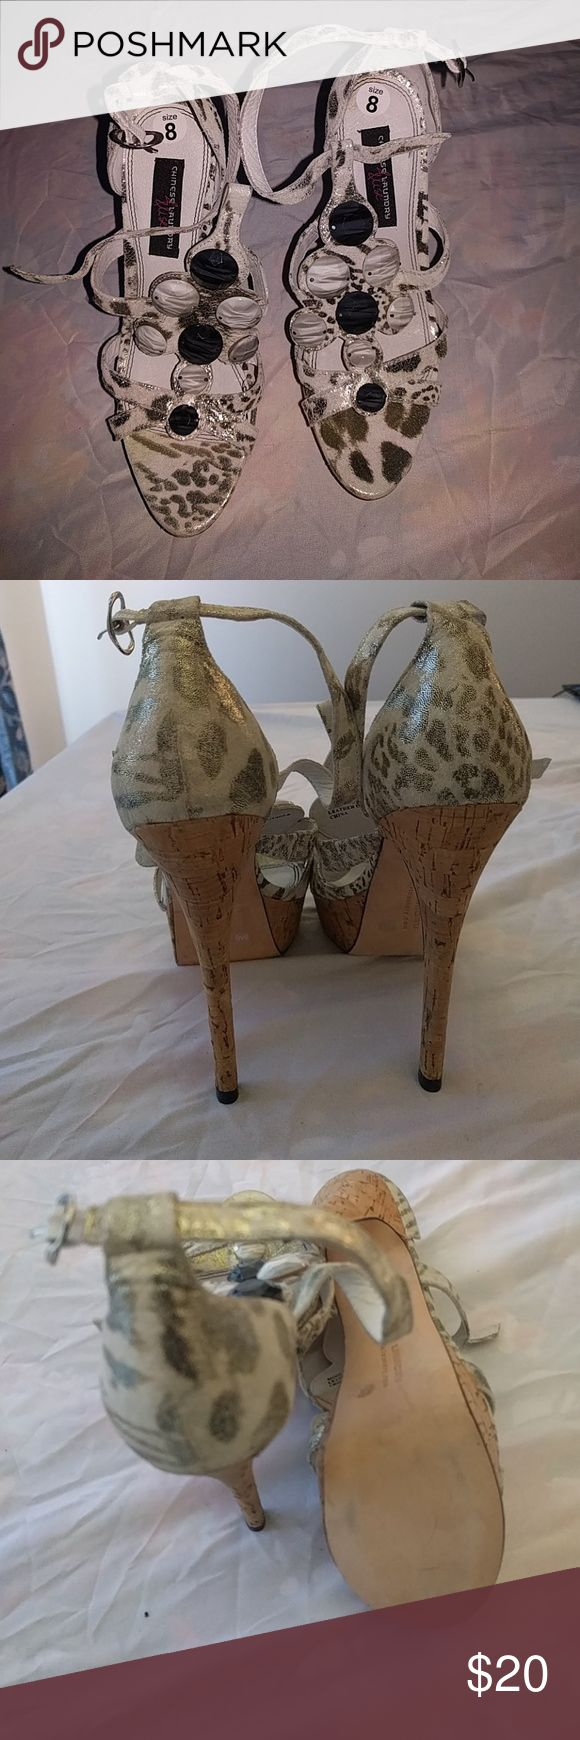 "Chinese Laundry 6"" heels Chinese Laundry 6"" heels Chinese Laundry Shoes Heels"